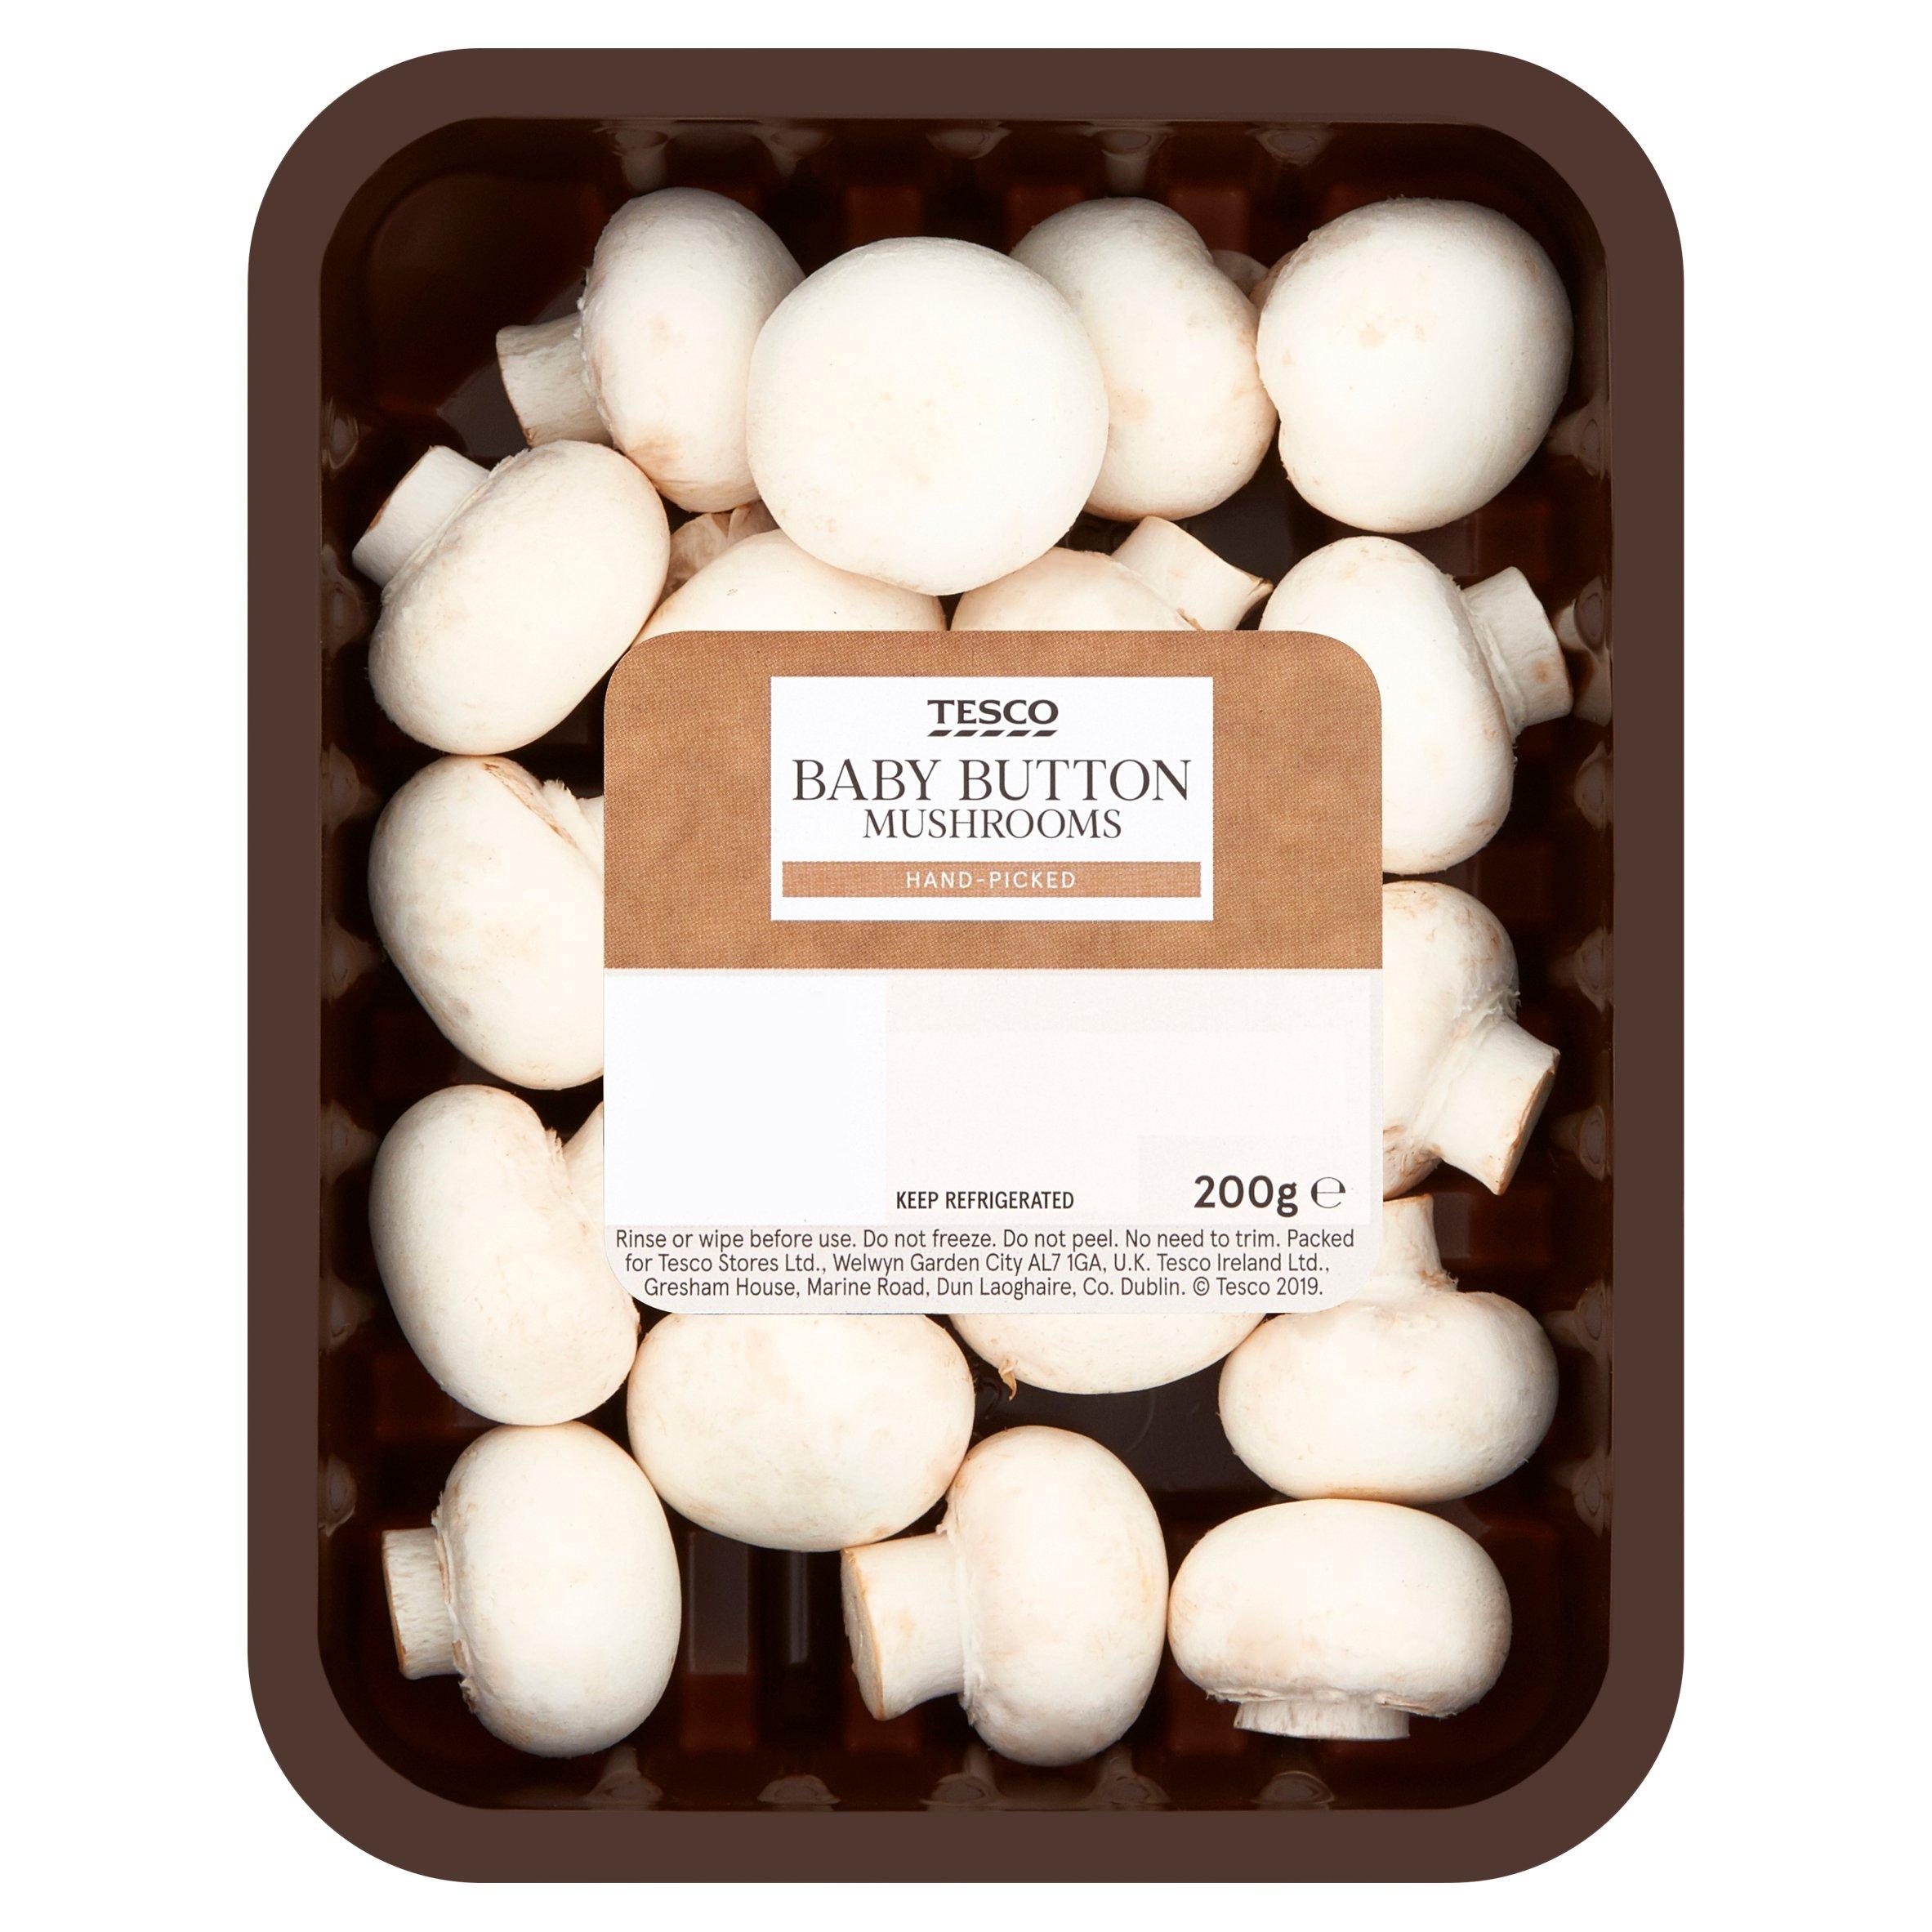 Tesco Baby Button Mushrooms 200G